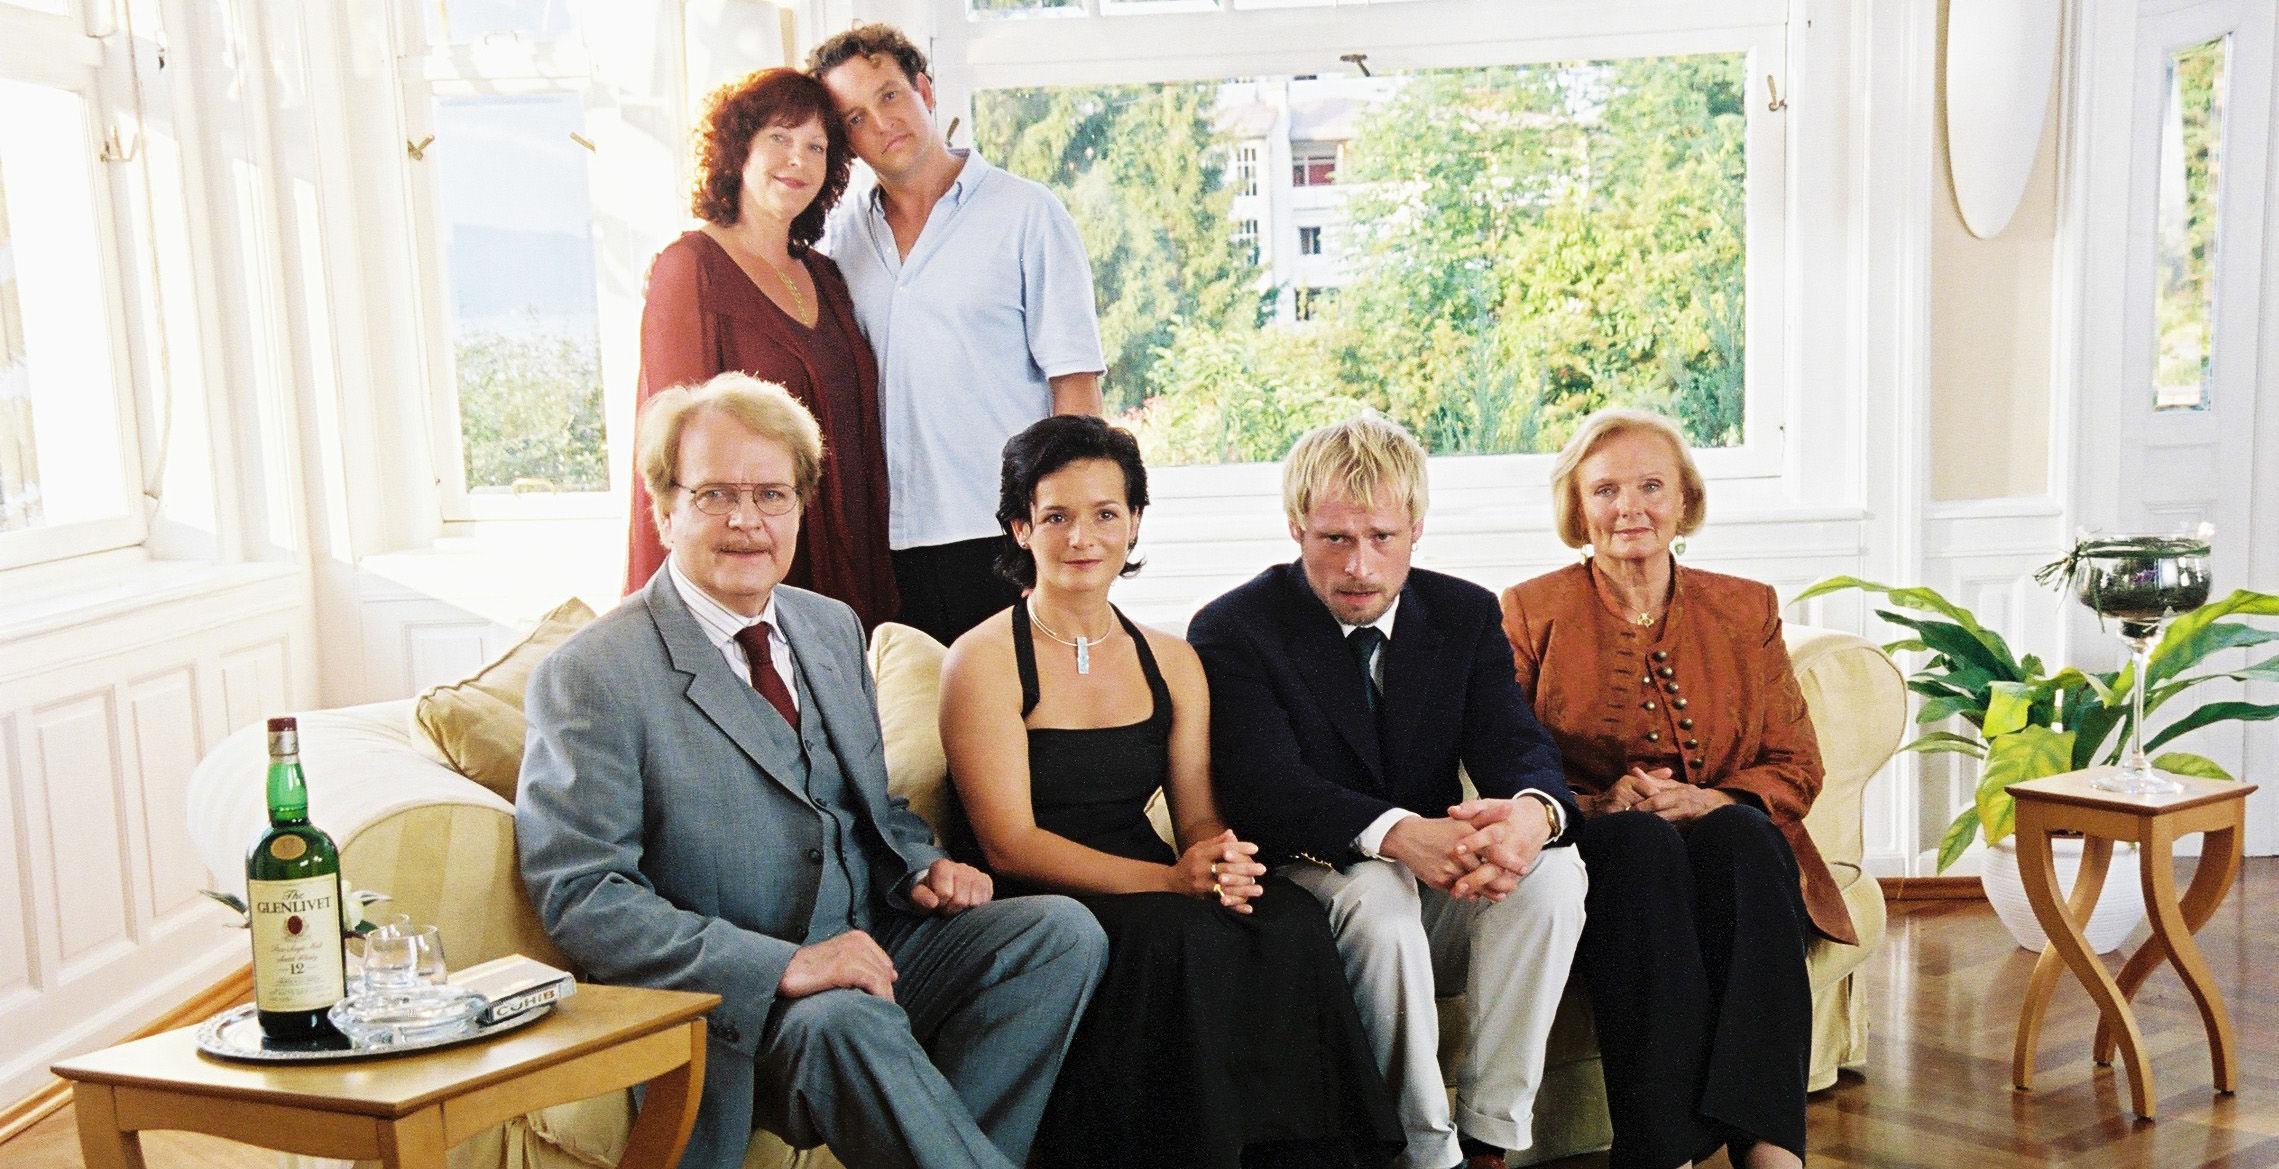 Albert (Peter Fricke), Conny (Elfi Eschke), Freddy (Marco Rima), Diana (Katharina Stemberger), Rene (Johannes Krisch), Jacqueline (Ruth Maria Kubitschek)